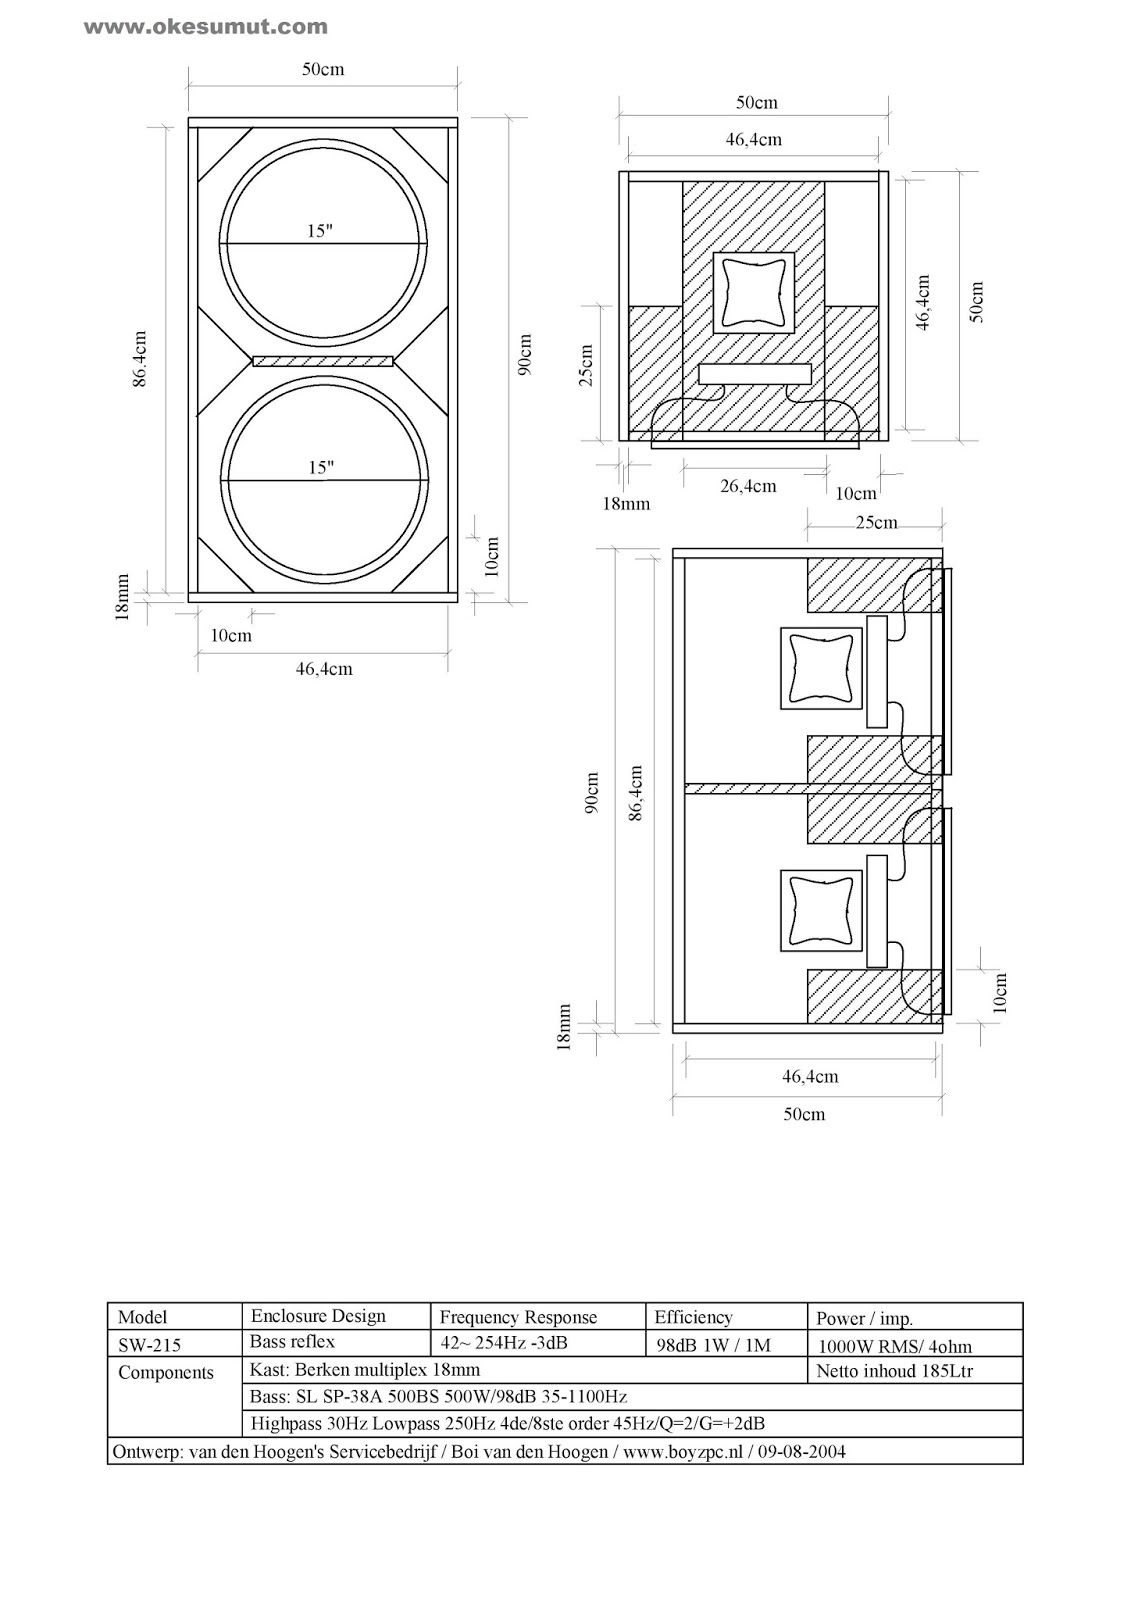 box speaker 15x2 bass selamat datang sebelumnya di oeksumut disini diagram chart box speaker [ 1131 x 1600 Pixel ]